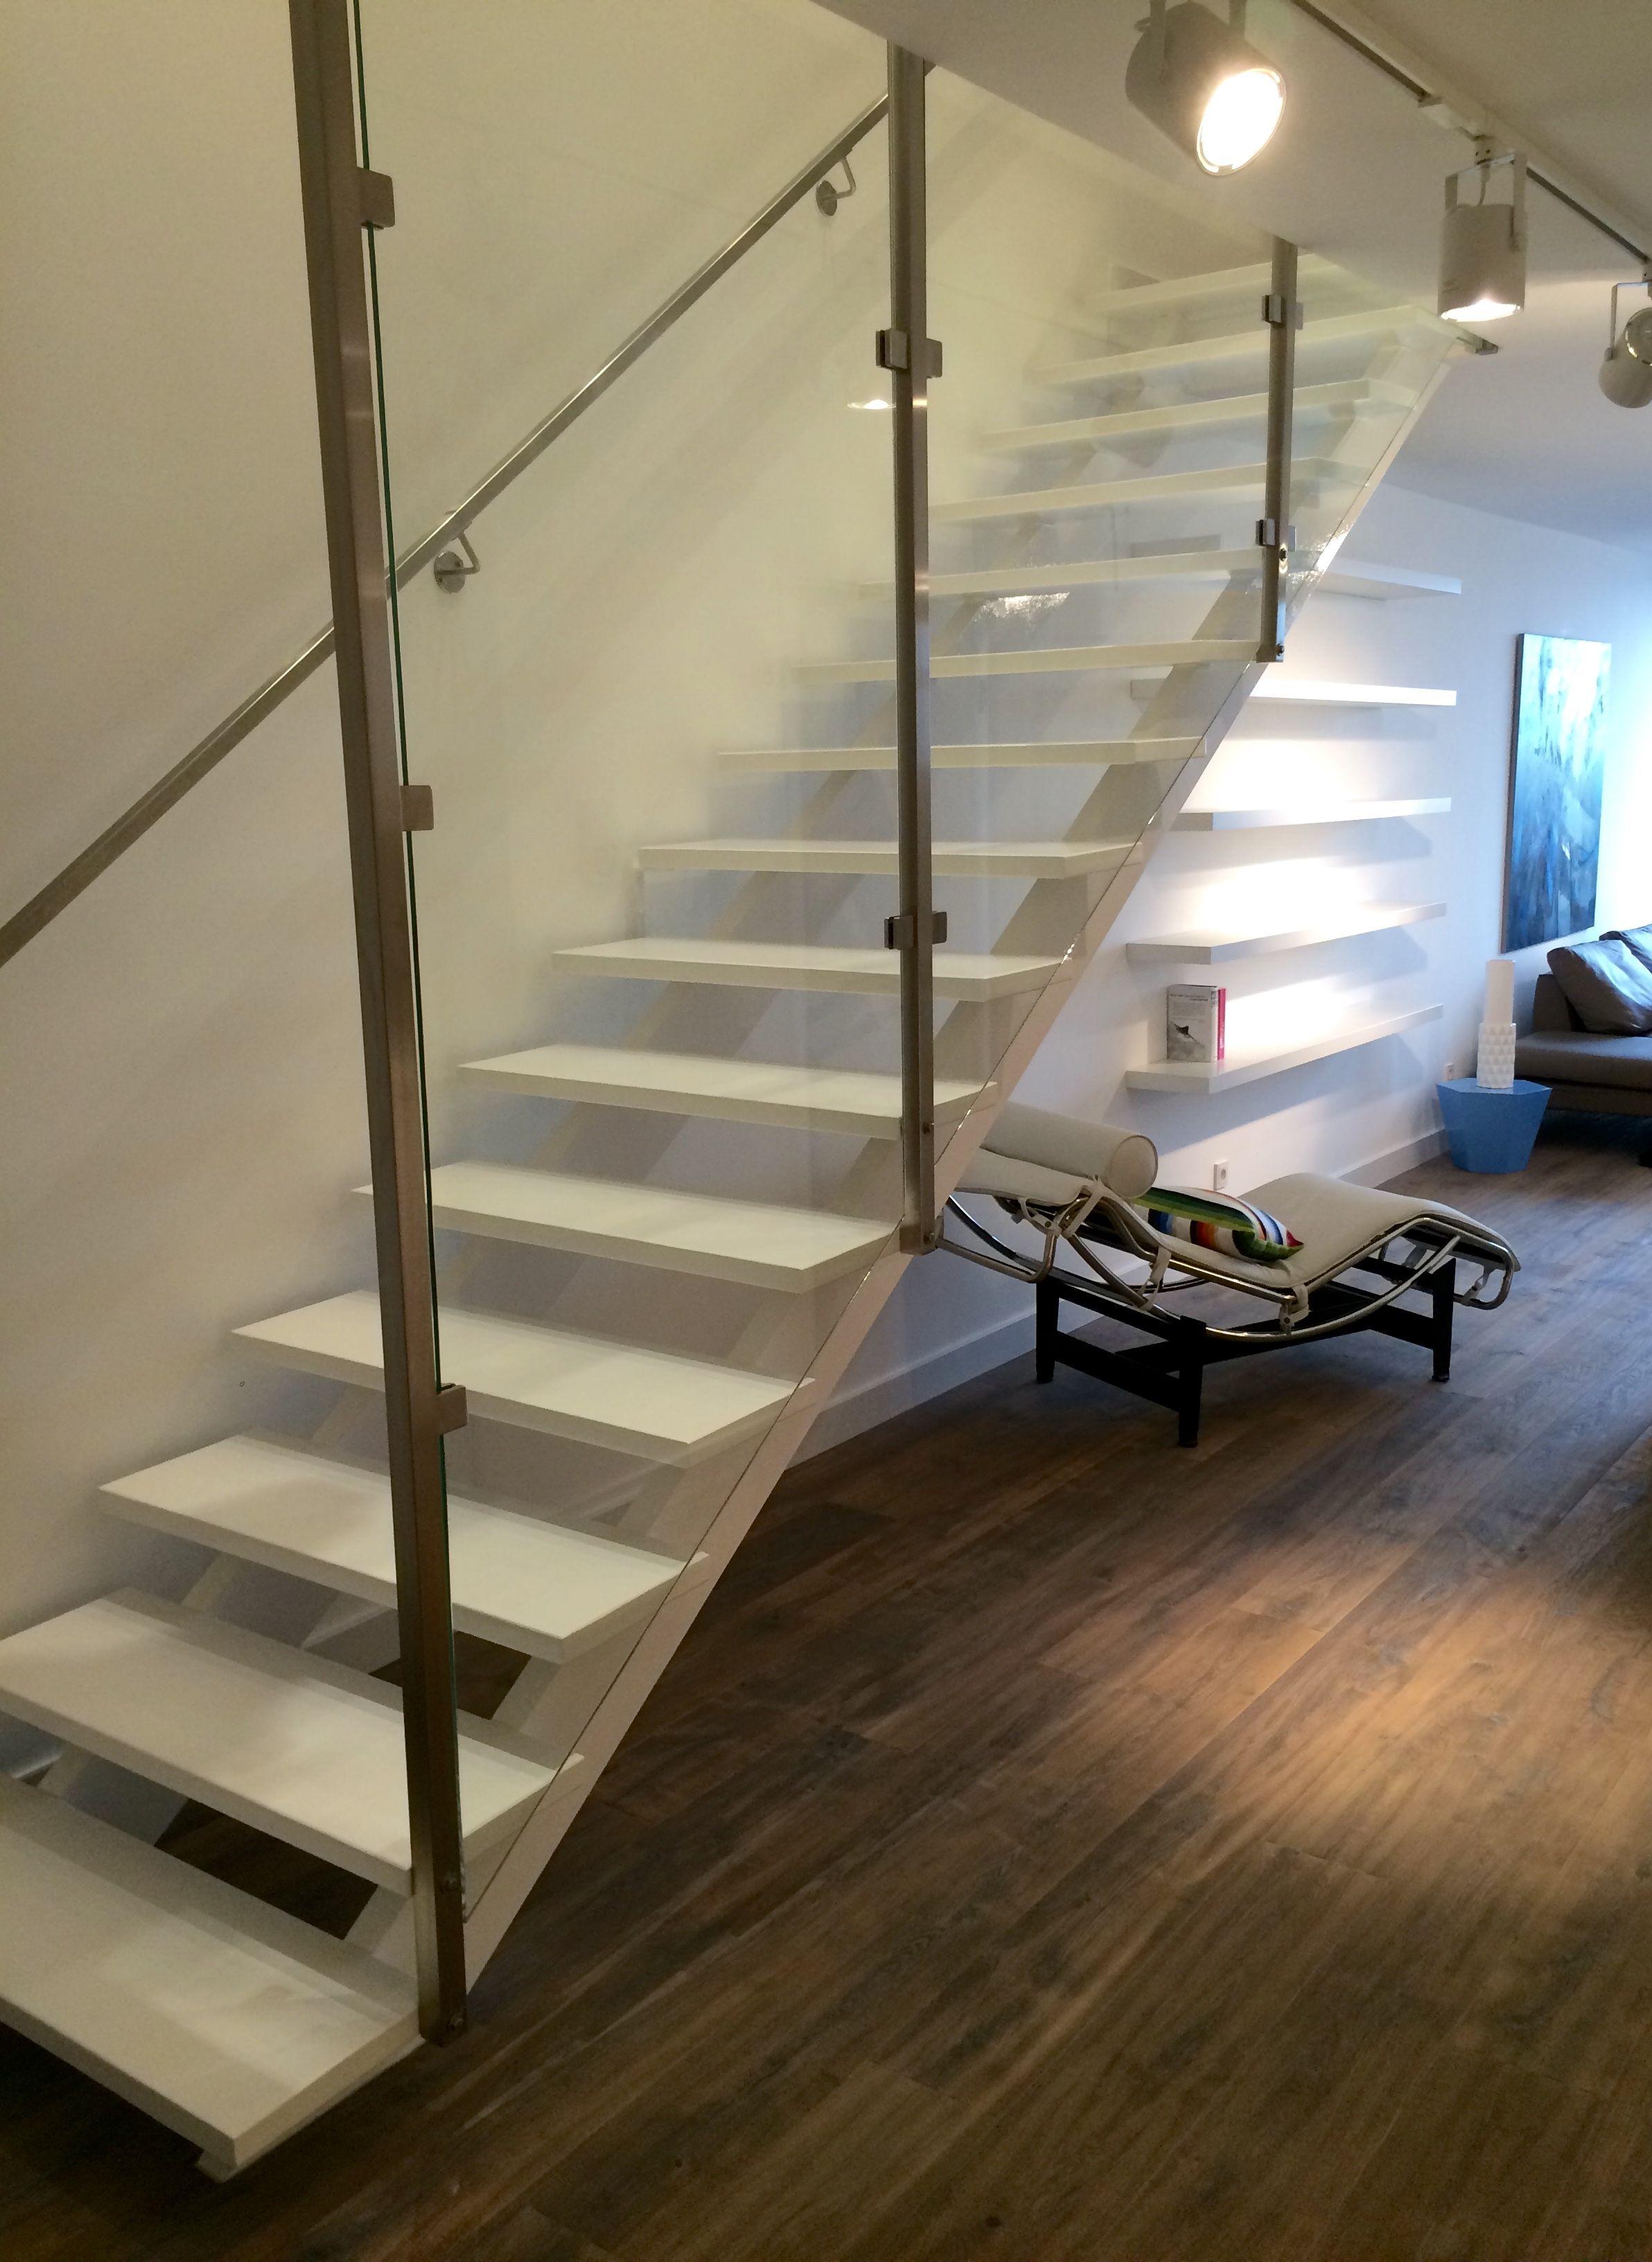 1000+ images about Concrete & Glass apartments on Pinterest ...